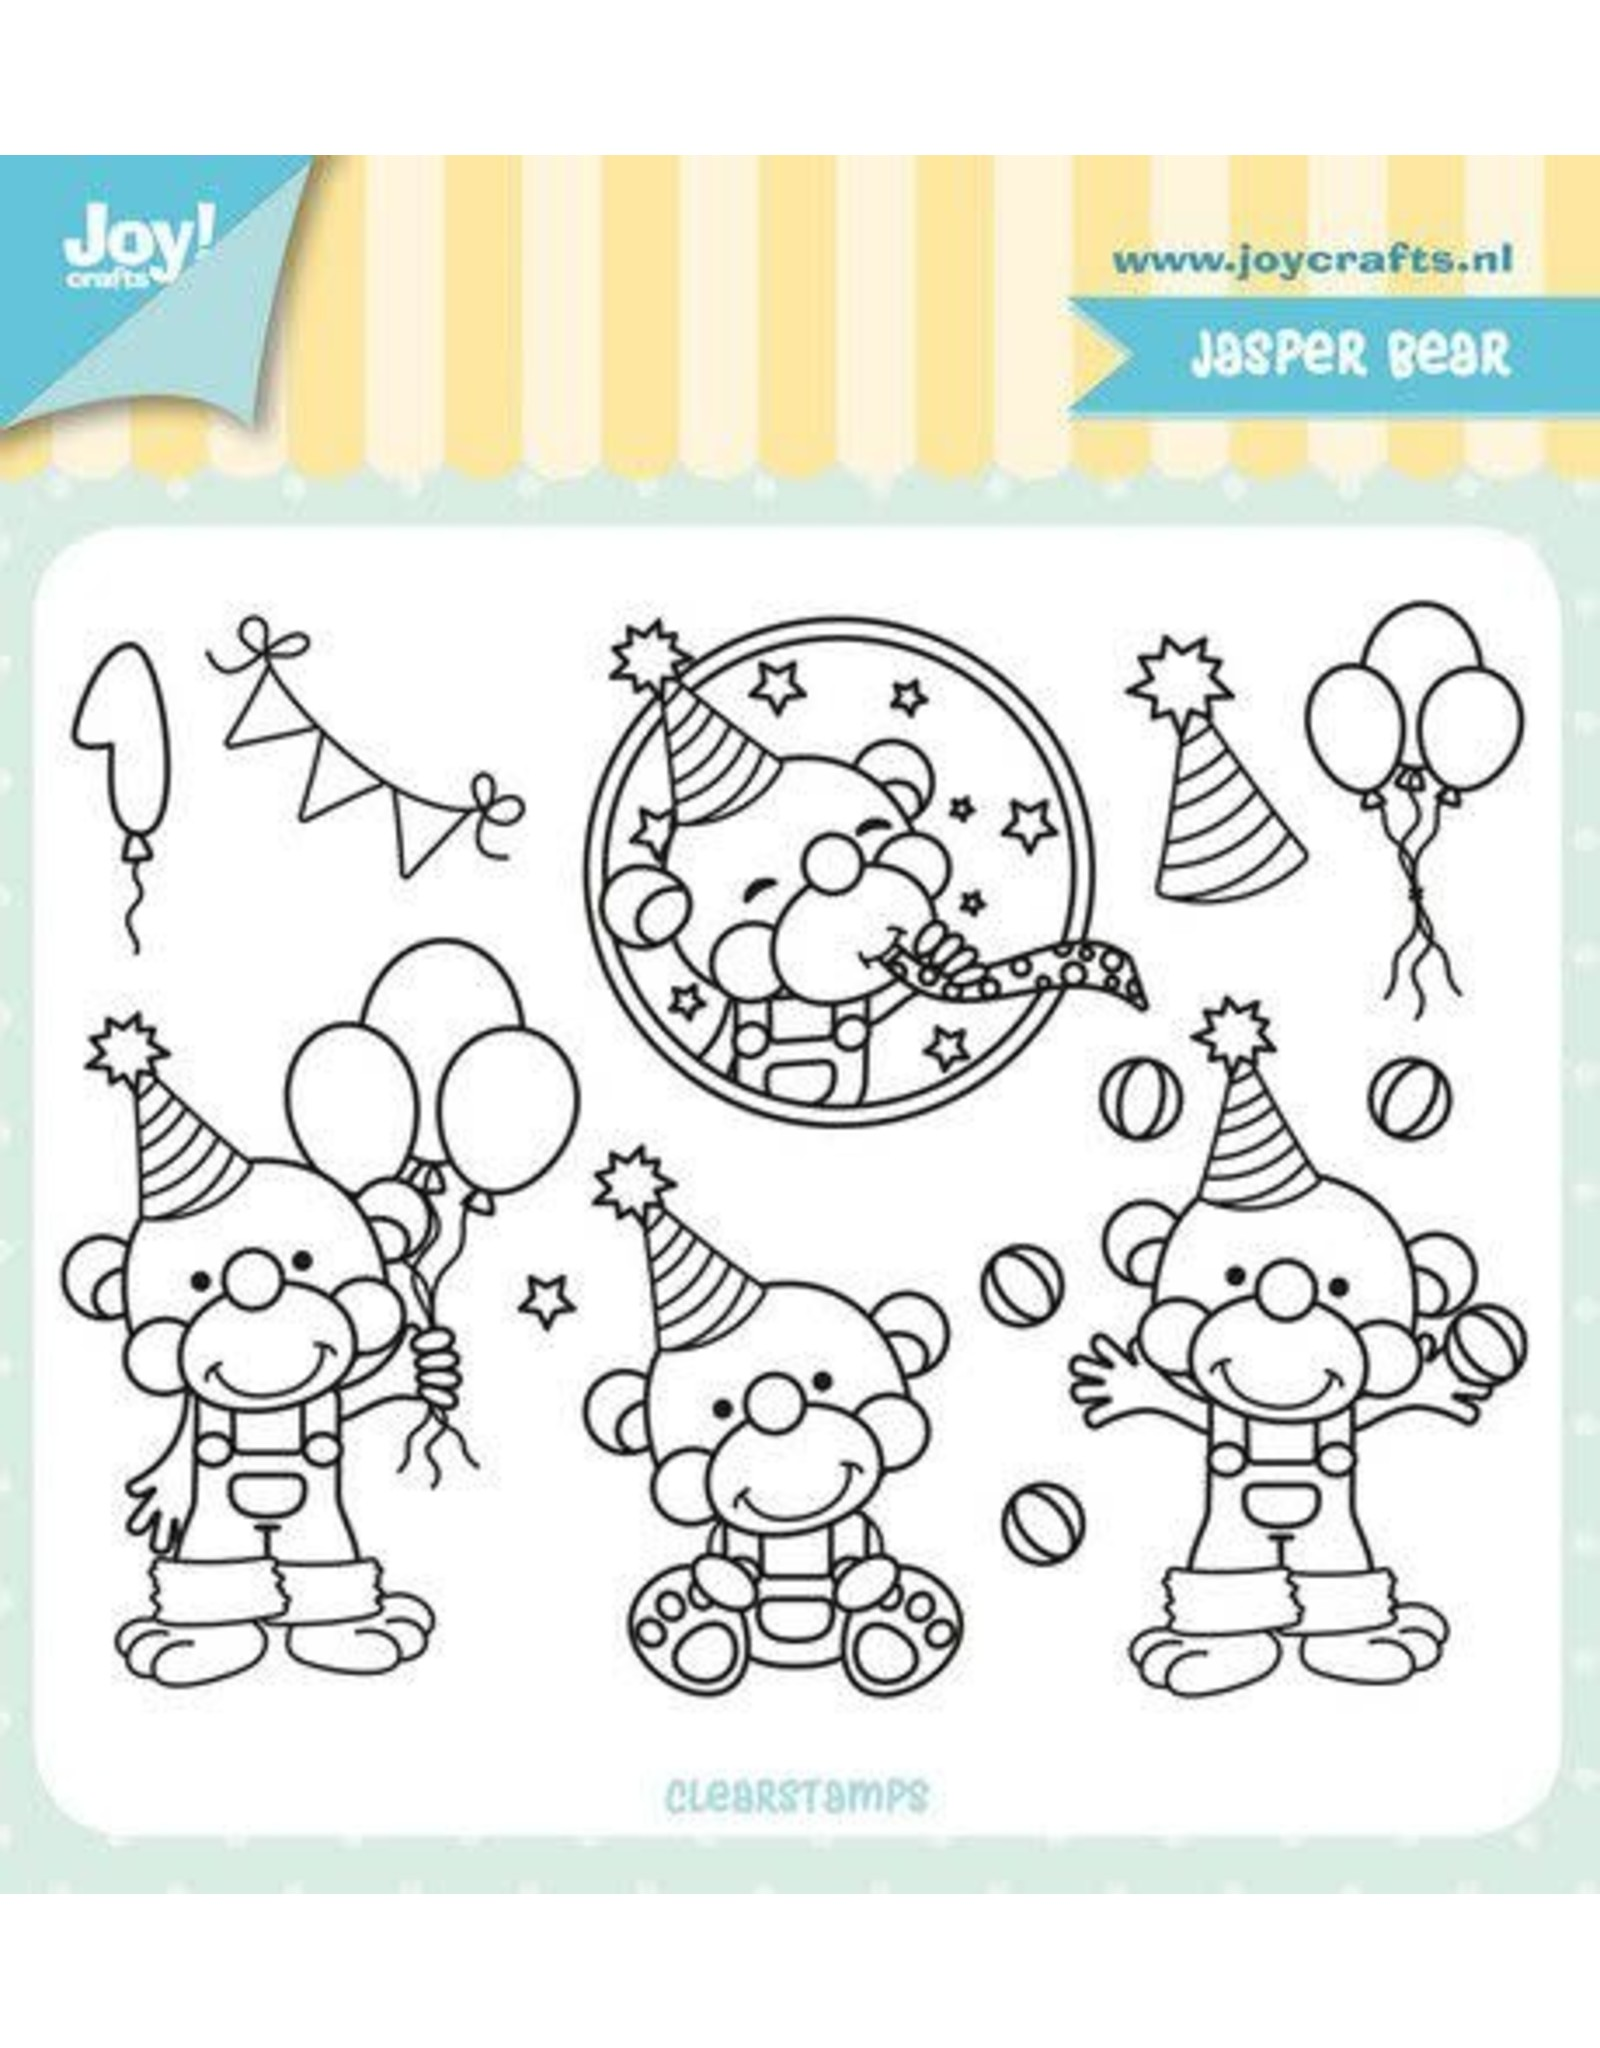 Joy Craft Joy! Crafts Clearstempel - Jocelijne - Jasper Bear 6410/0516 110x83 mm